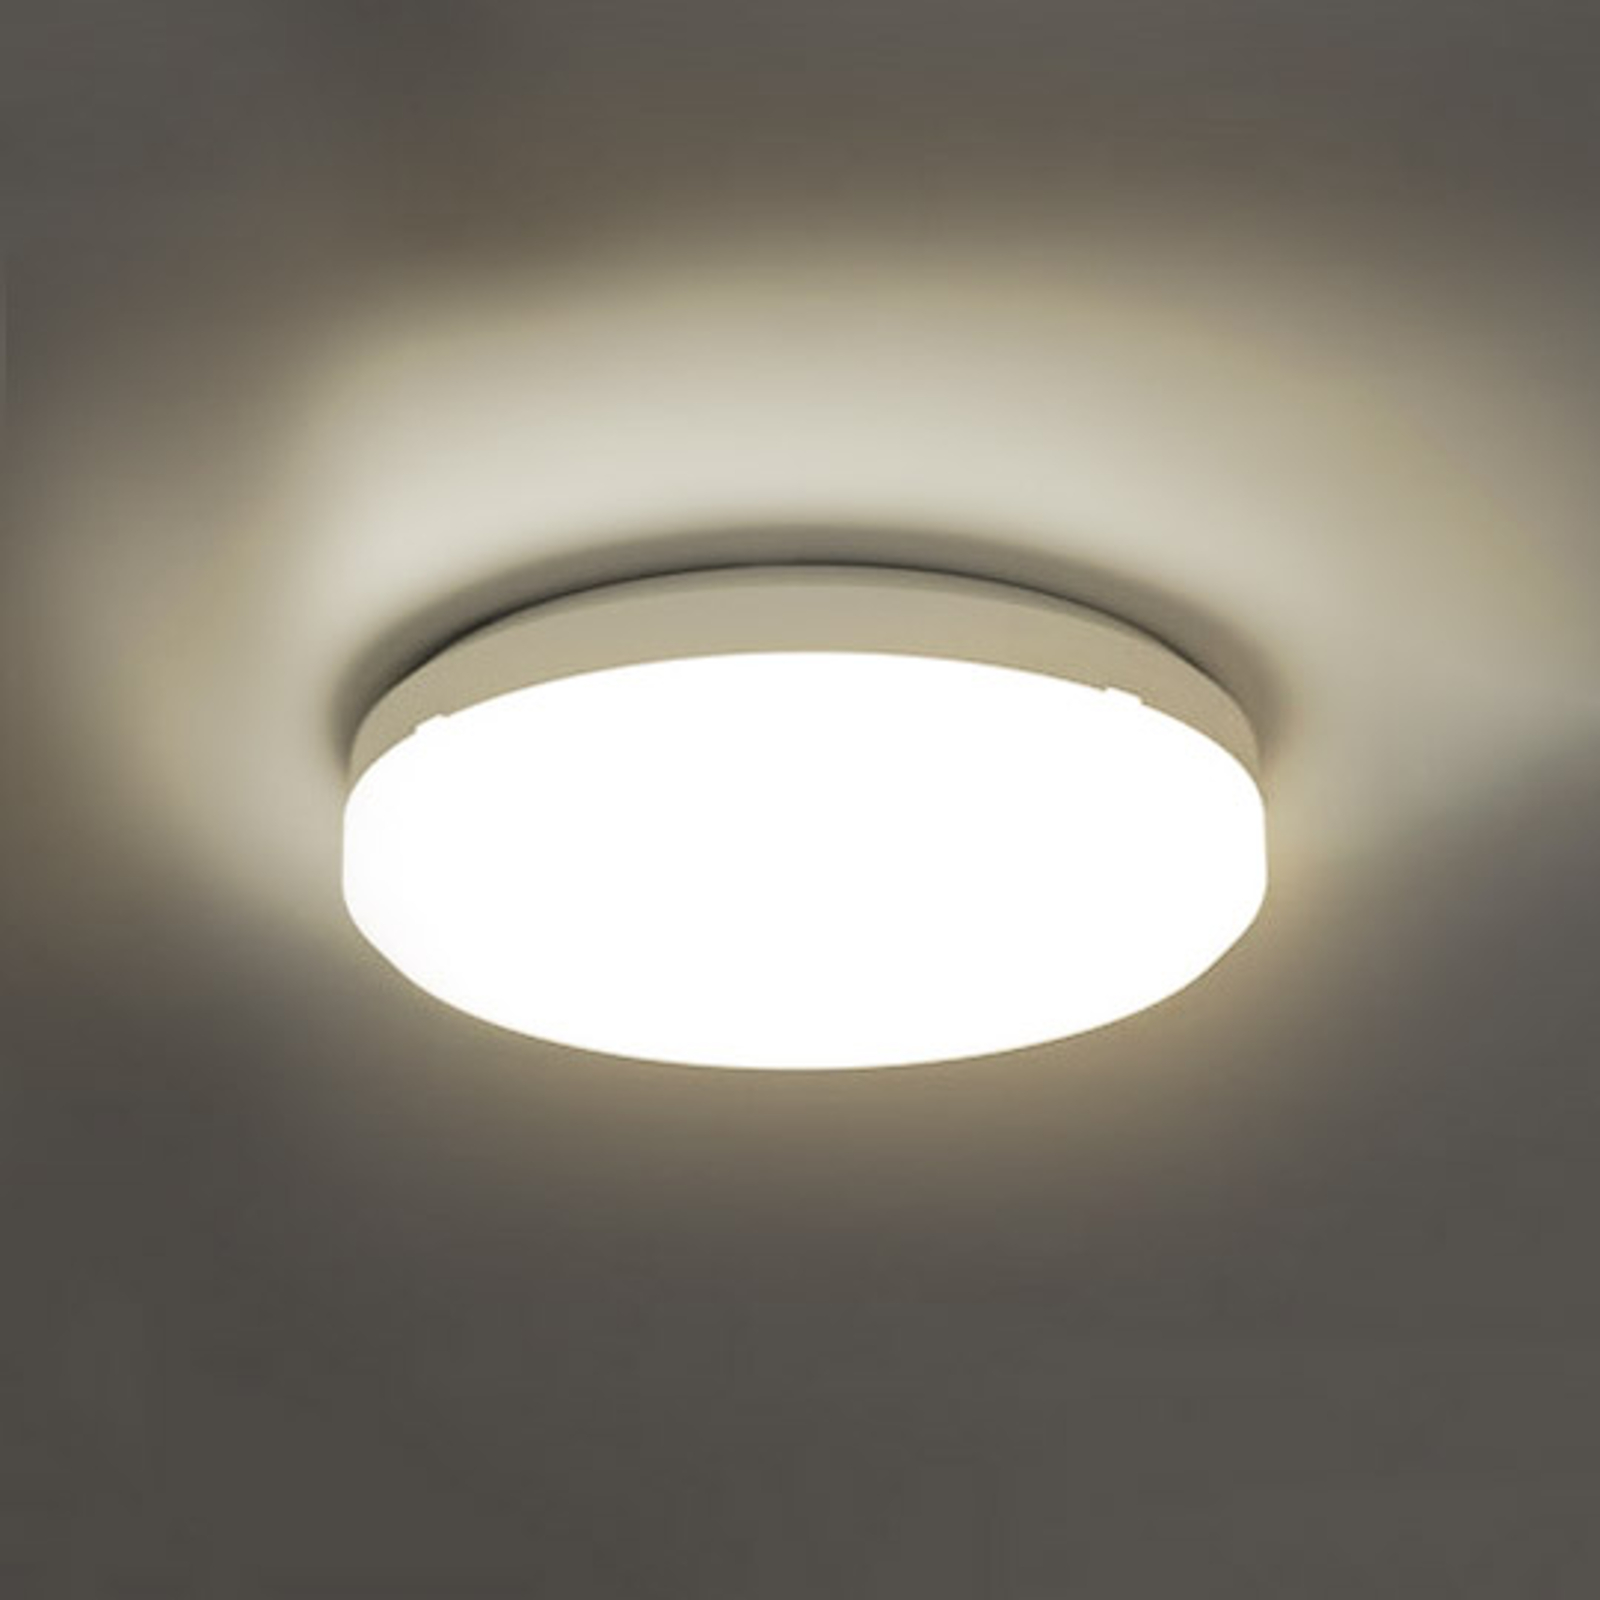 Sun 15 - LED-taklampa IP65, 18W 3000K vv